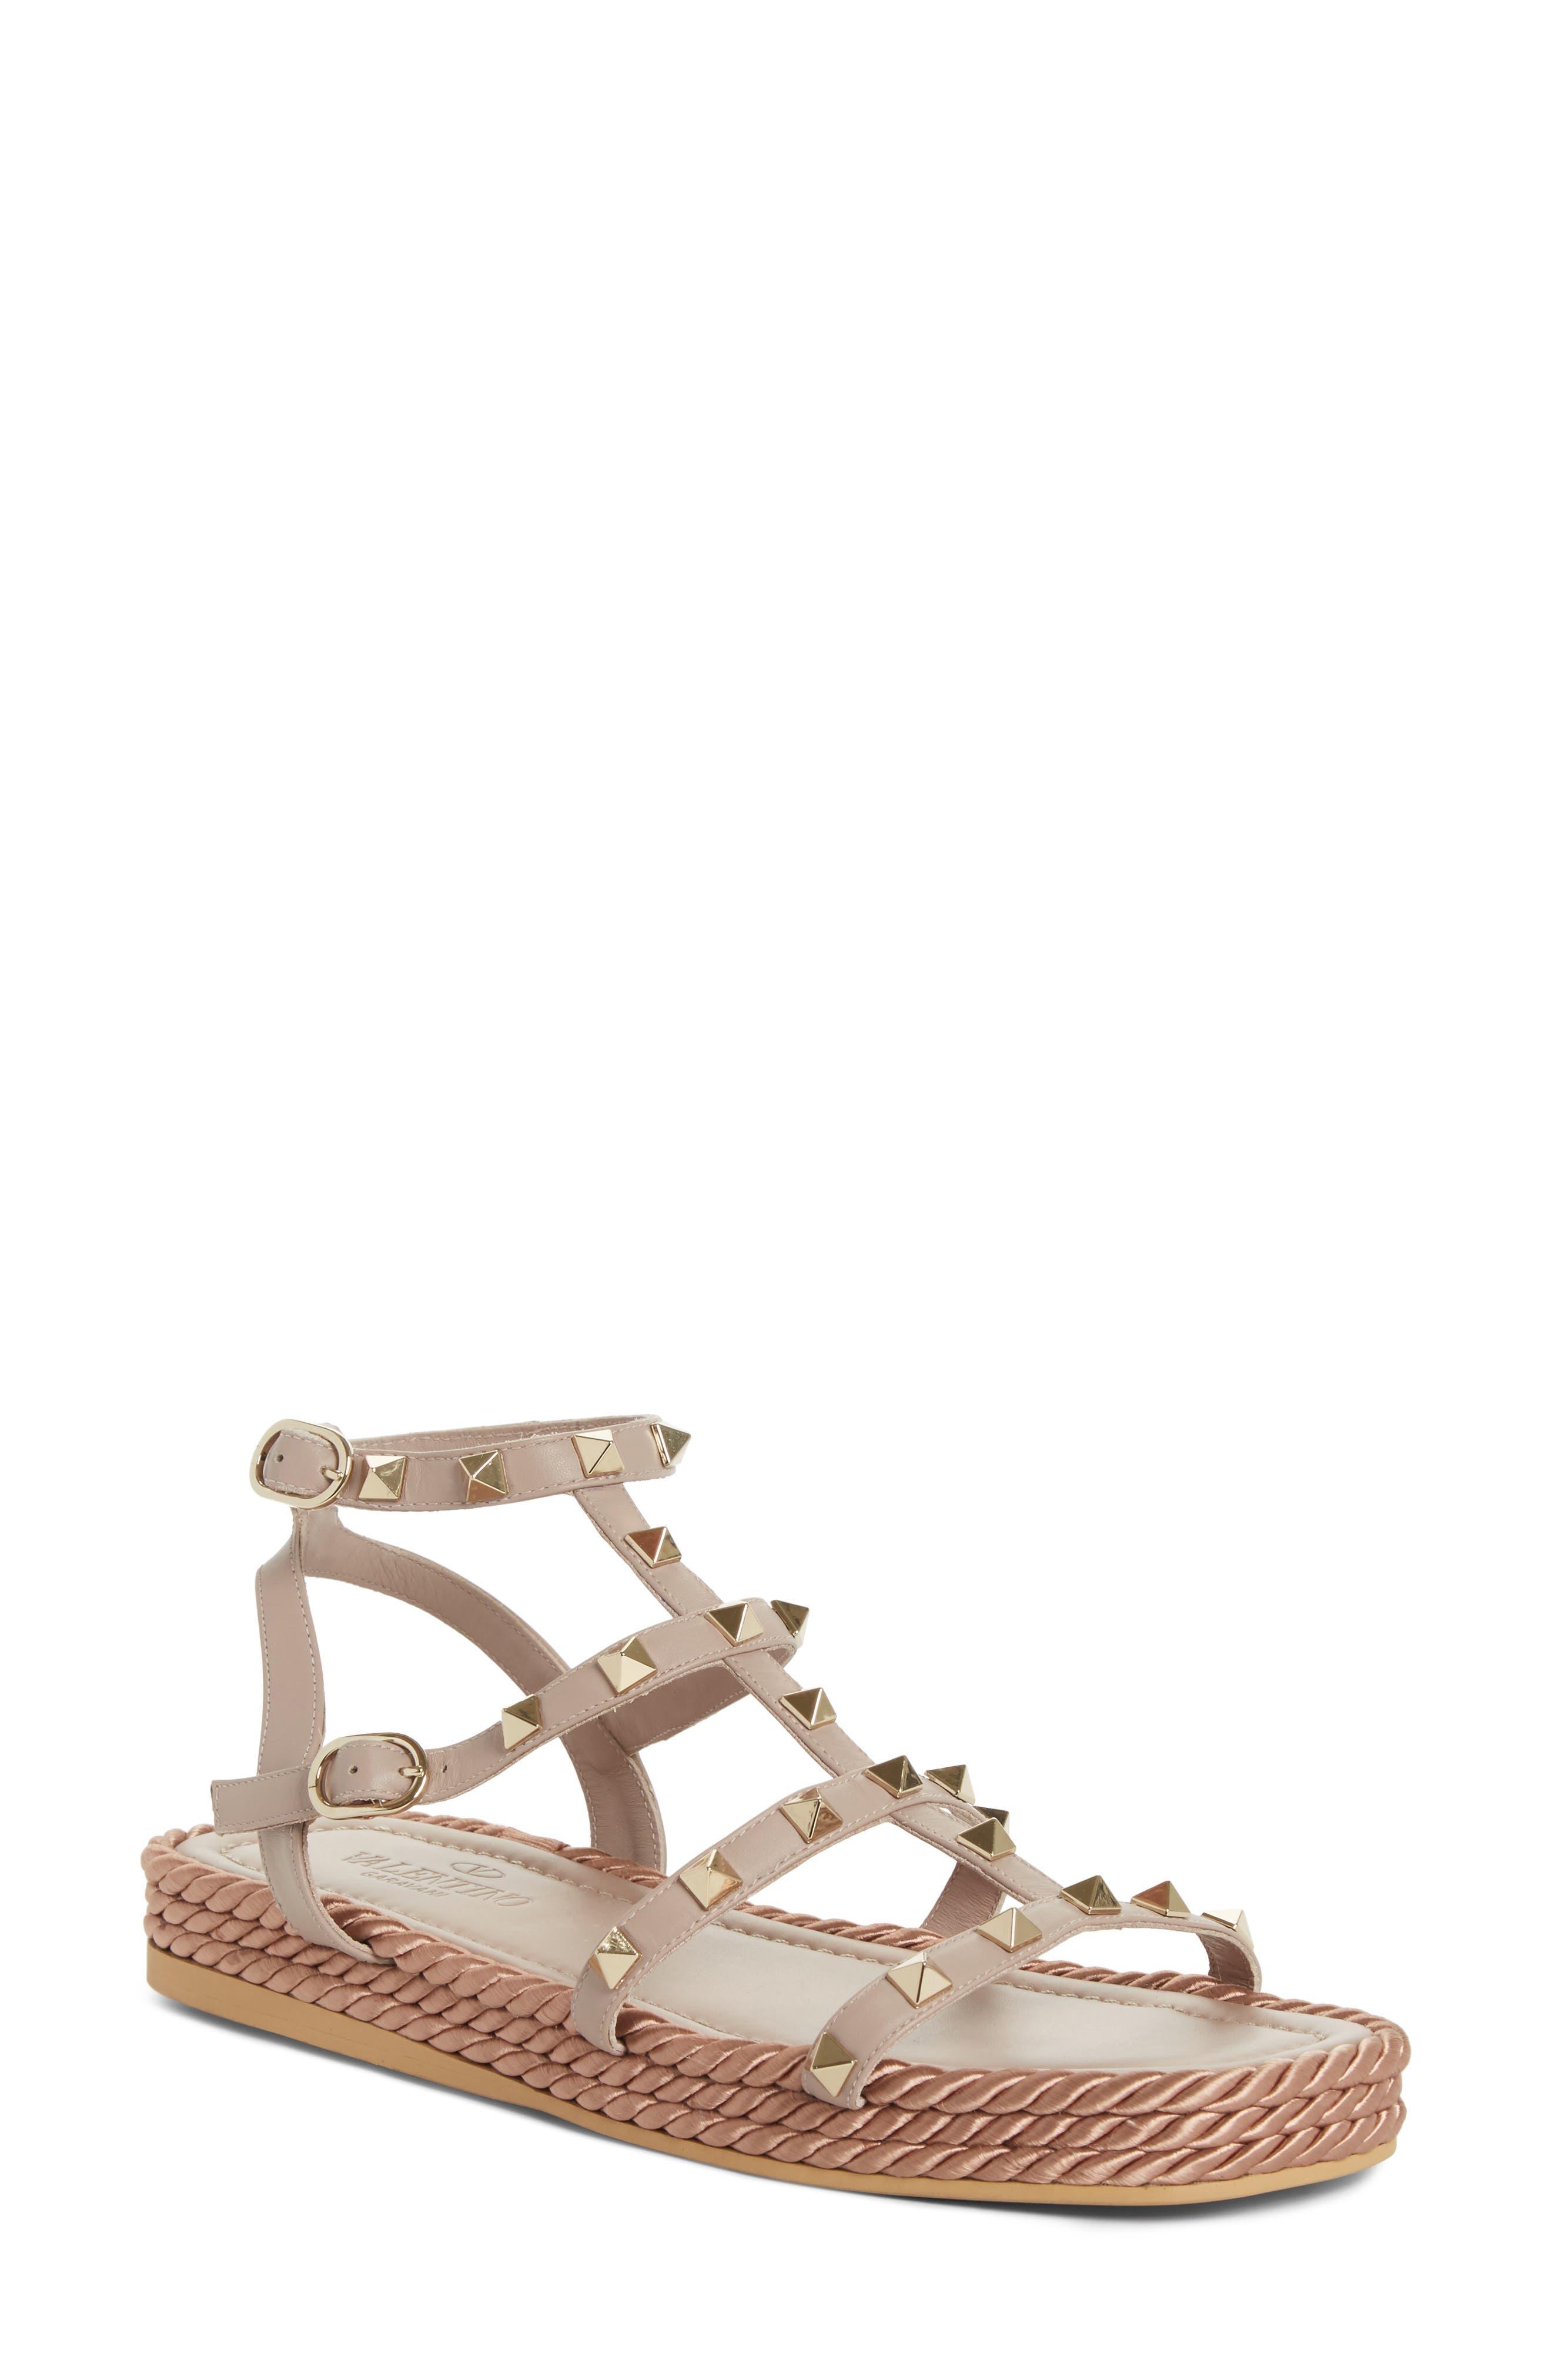 VALENTINO GARAVANI Torchon Strappy Sandal (Women)